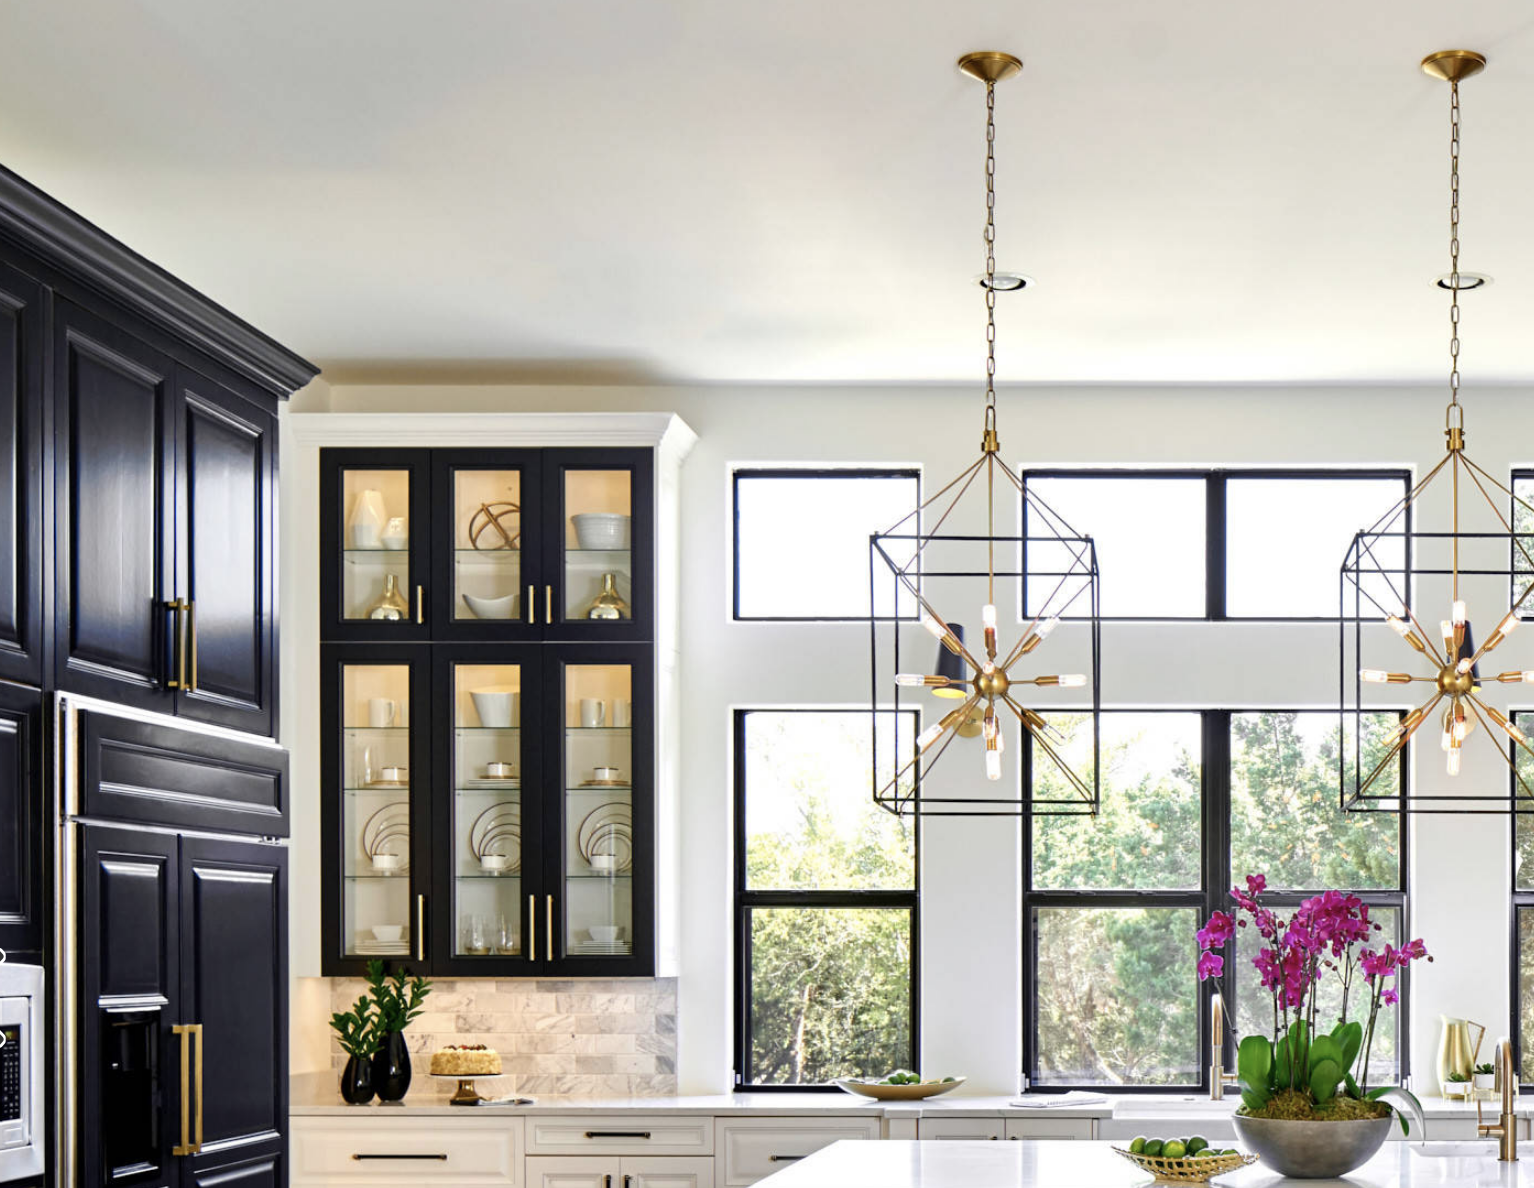 Kitchen and lighting SR Interiors